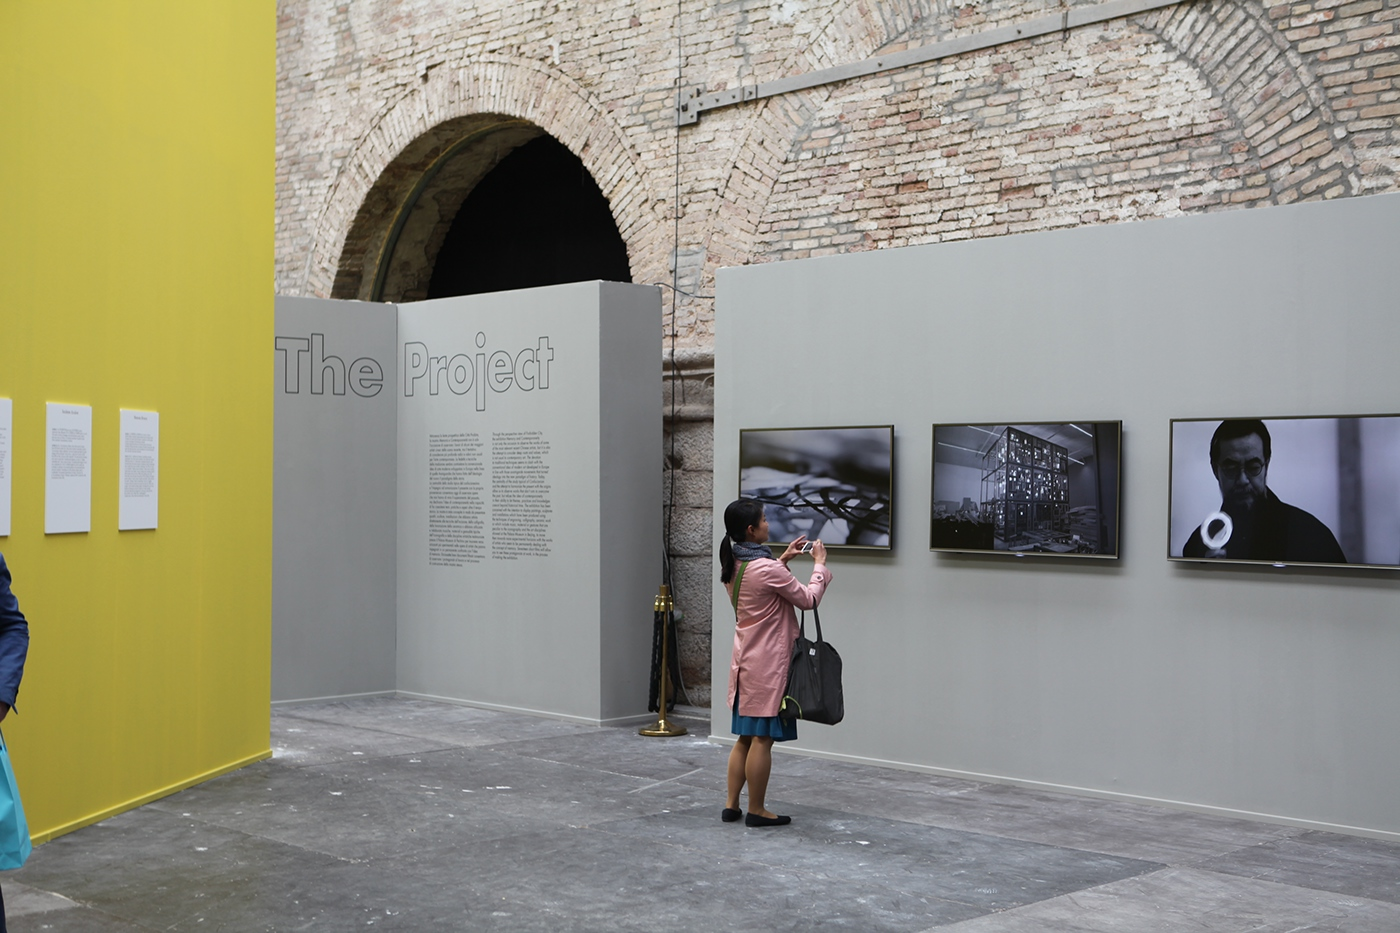 Exhibition  biennal graphic Venice